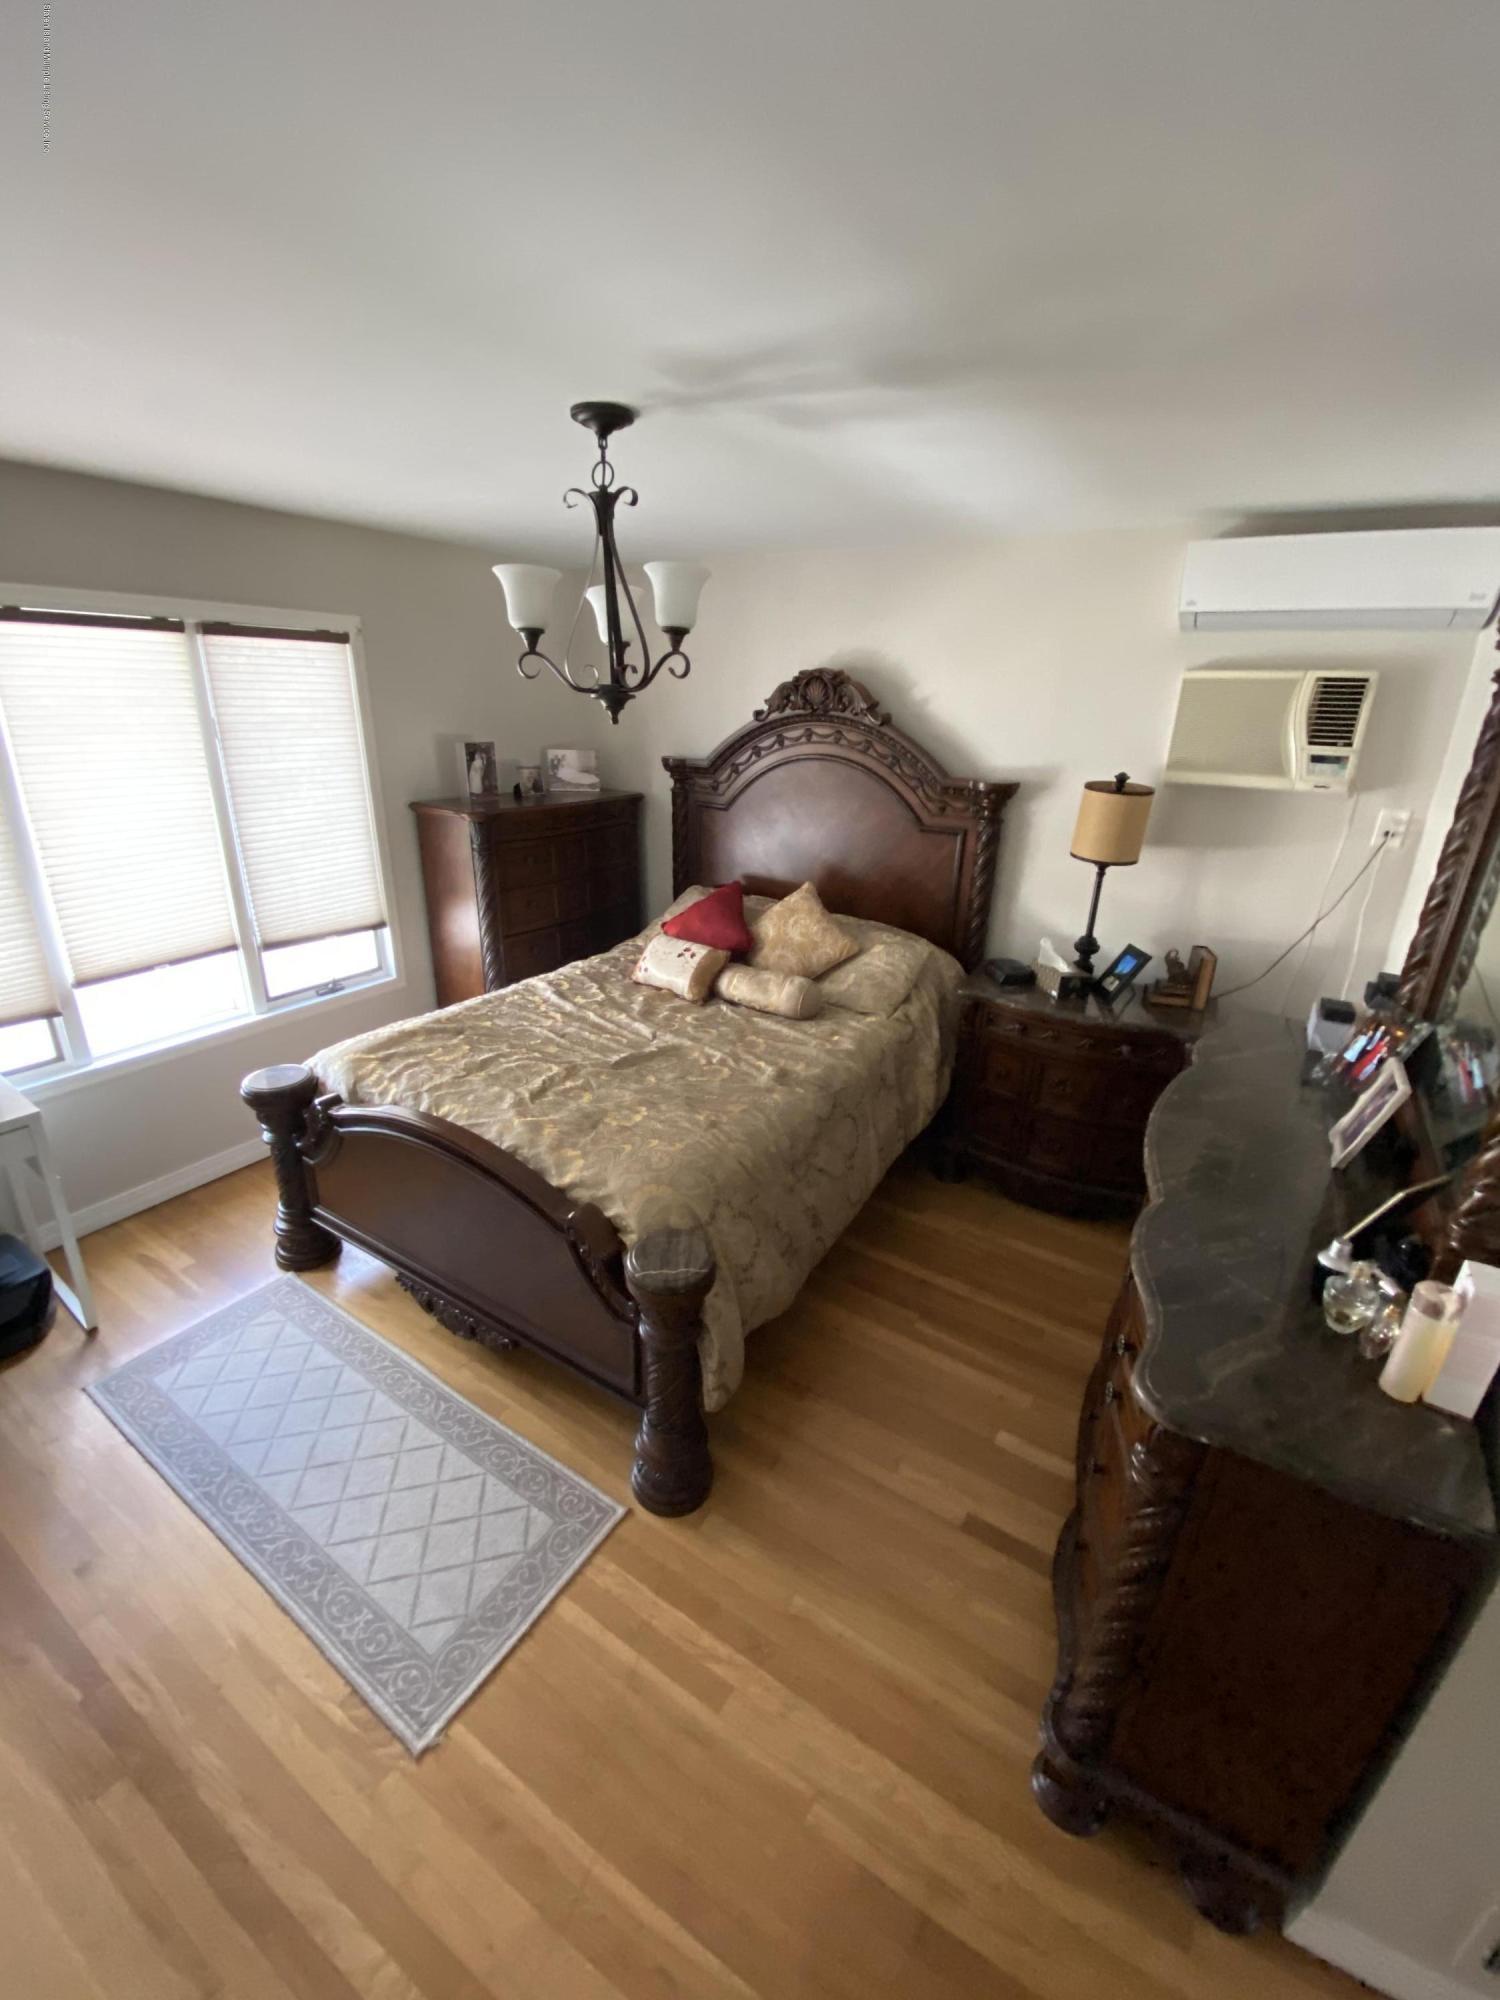 Single Family - Semi-Attached 370 Seaver Avenue  Staten Island, NY 10305, MLS-1136339-17